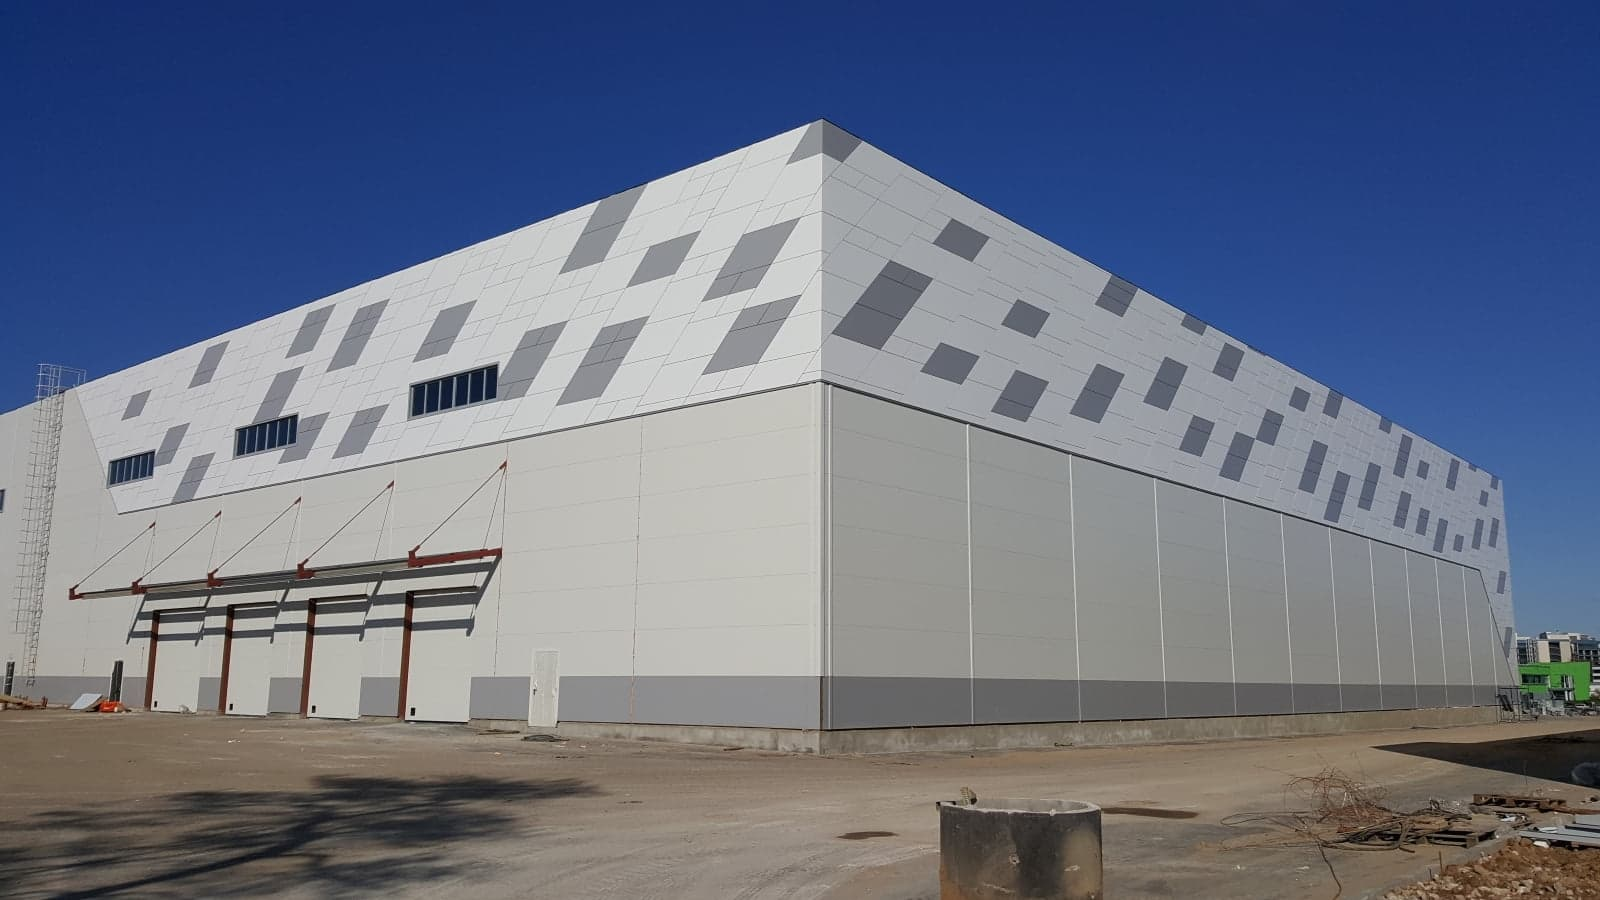 Фасад из линеарных панелей3